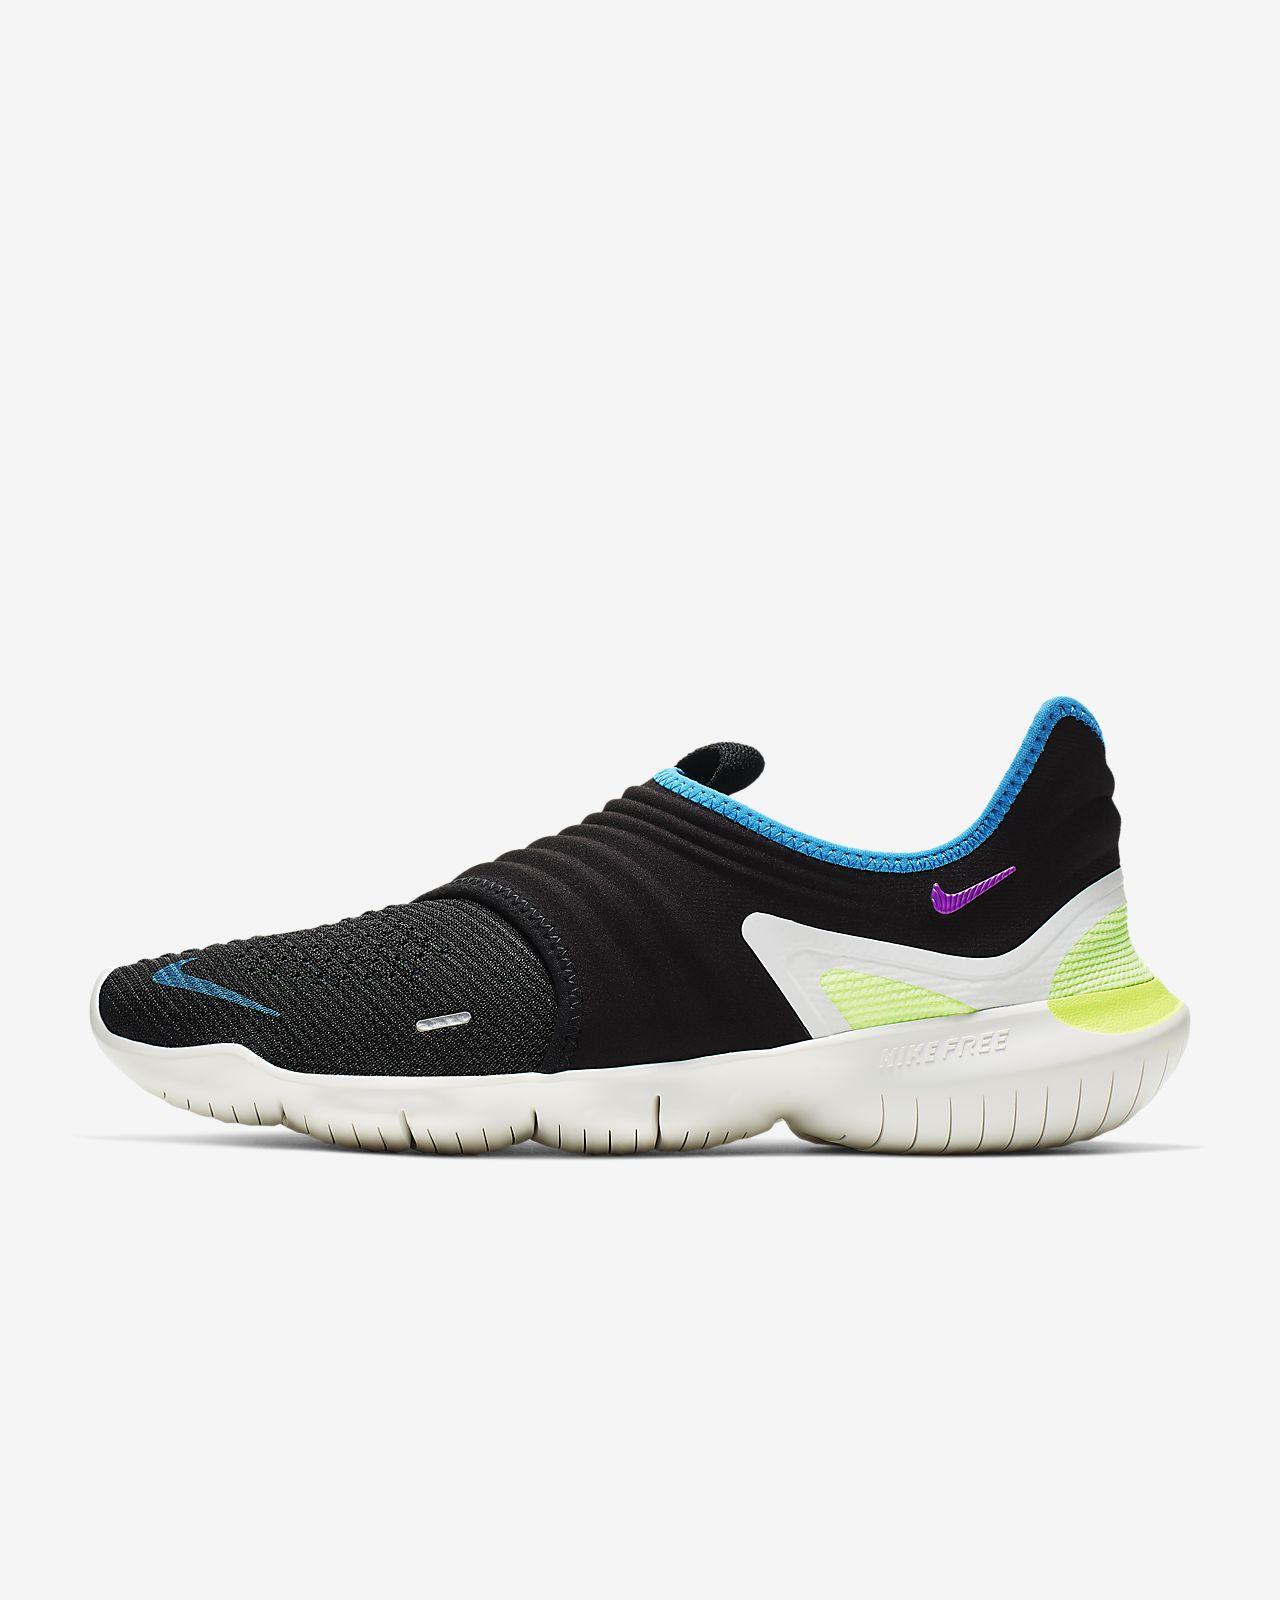 Calzado de running para hombre Nike Free RN Flyknit 3.0